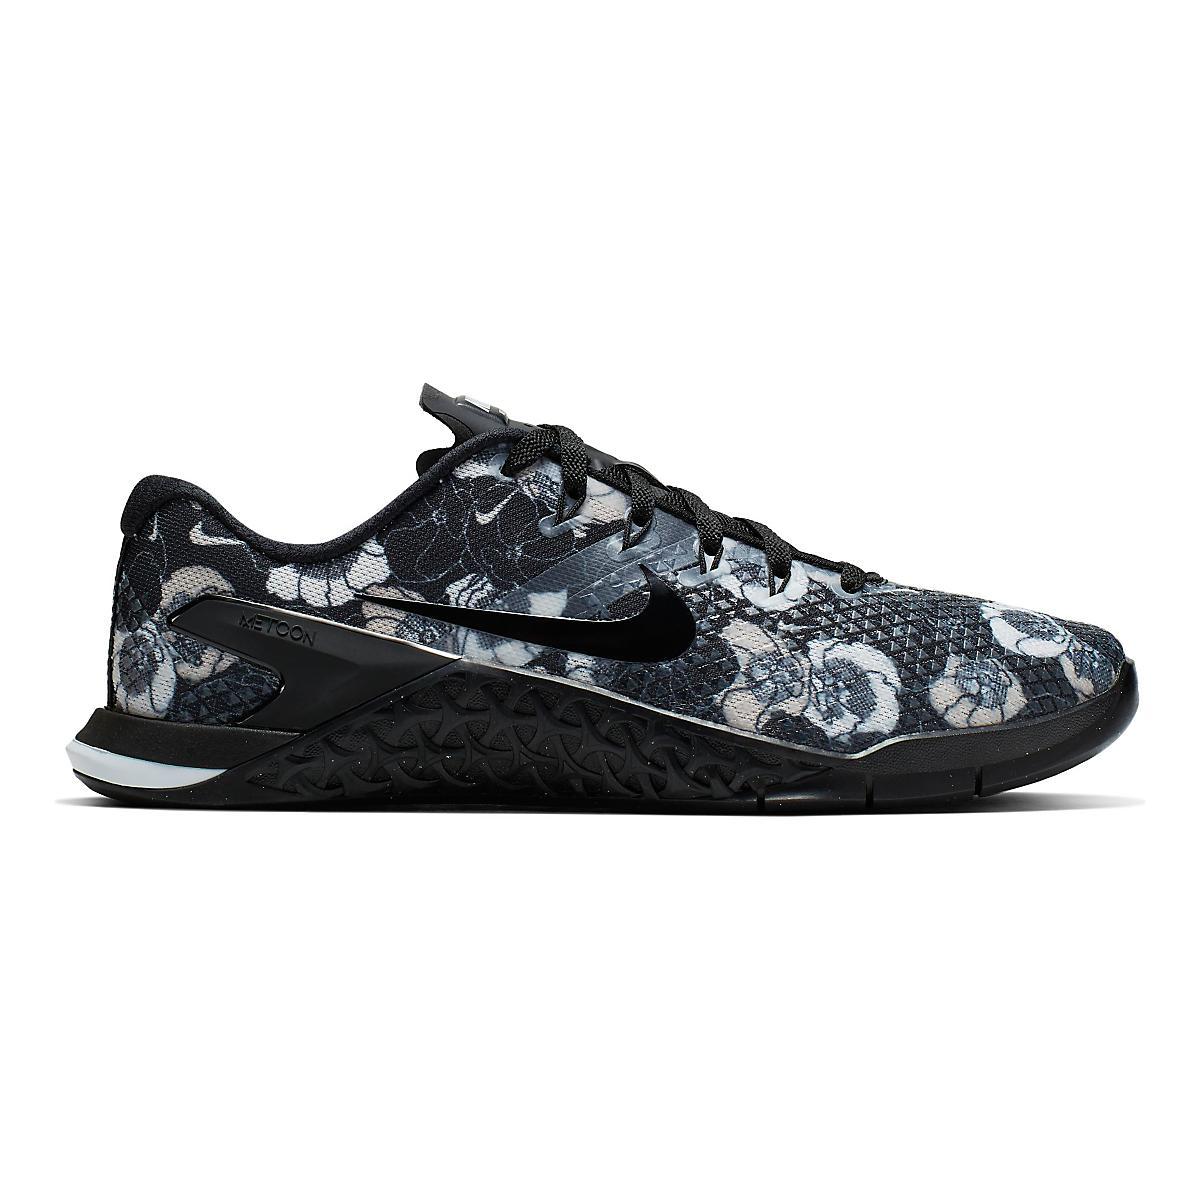 Womens Nike Metcon 4 XD Premium Cross